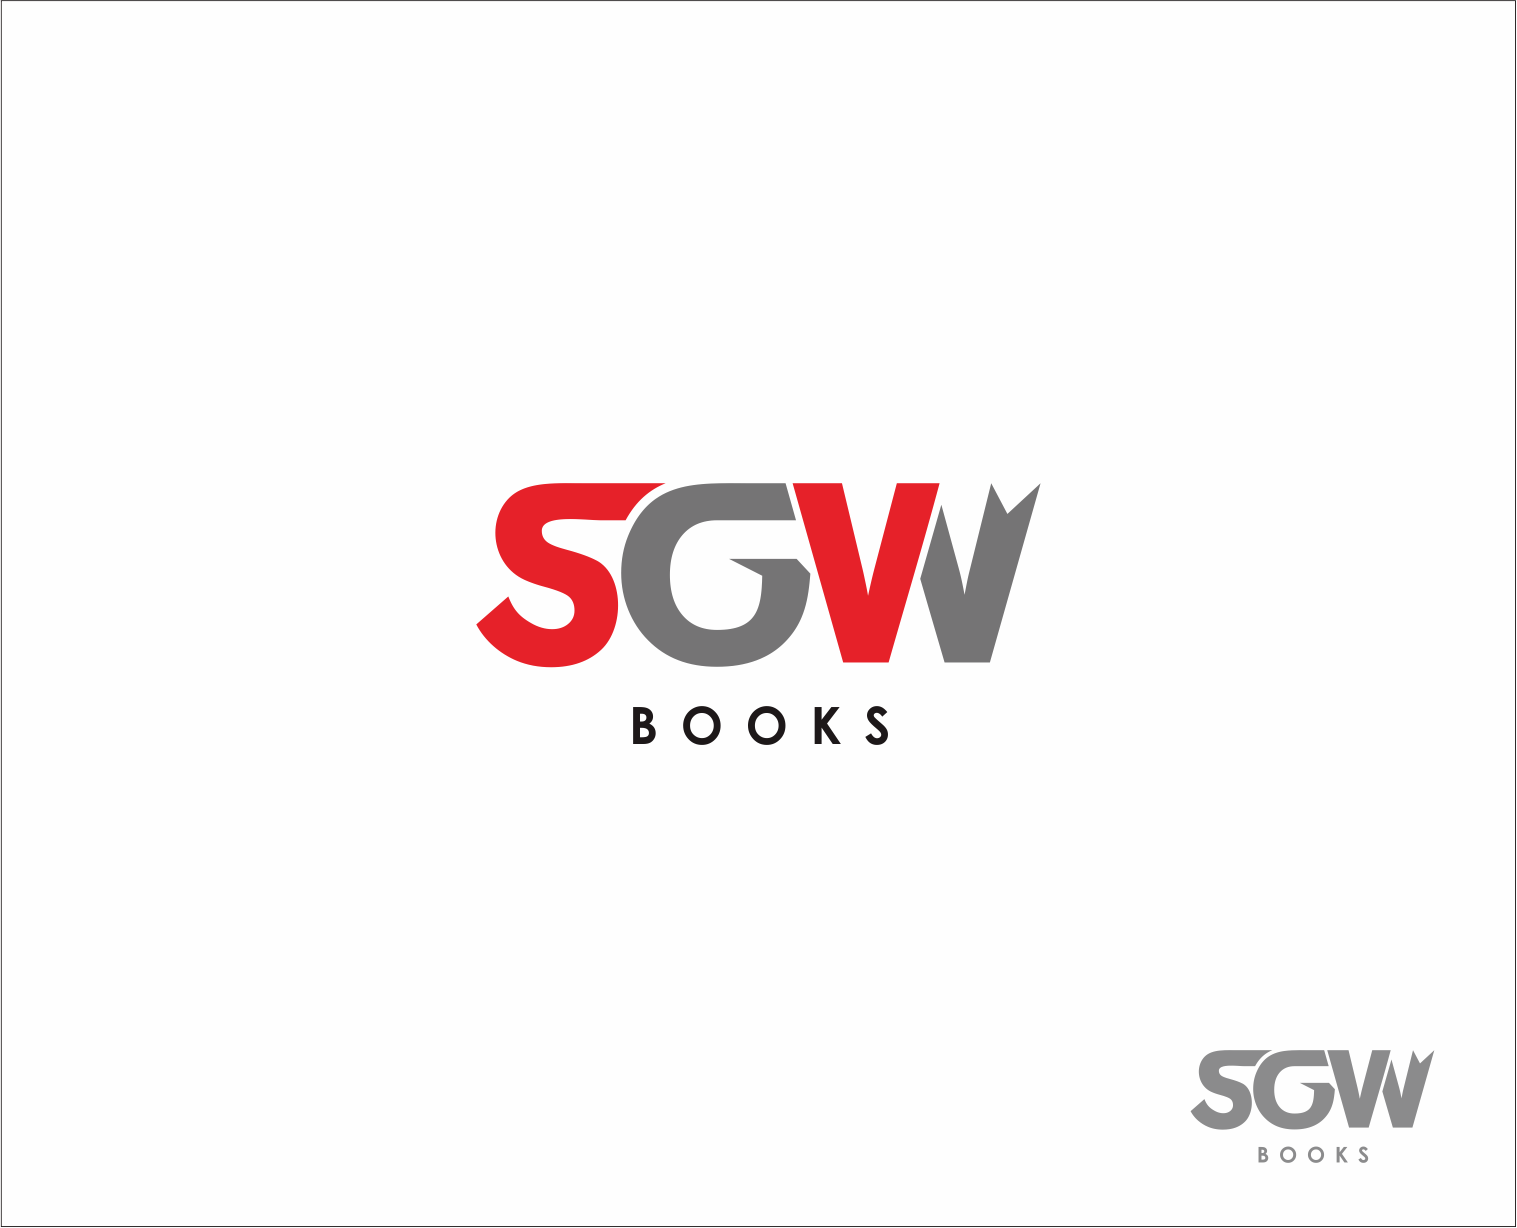 Logo Design by Armada Jamaluddin - Entry No. 52 in the Logo Design Contest SGW Books Logo Design.